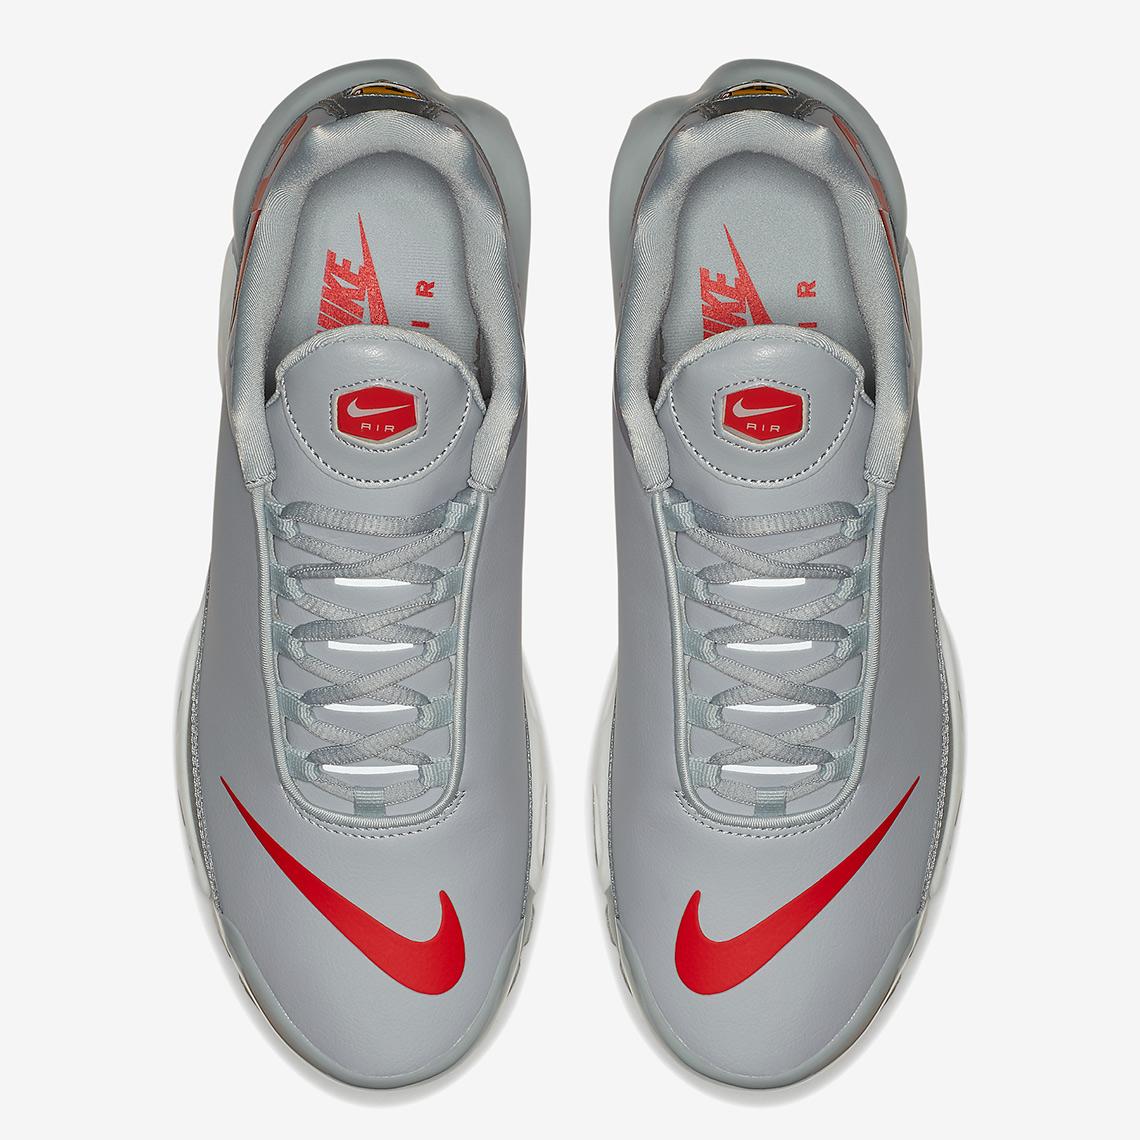 c67c853ee678 Nike Air Max Plus AQ1088-001